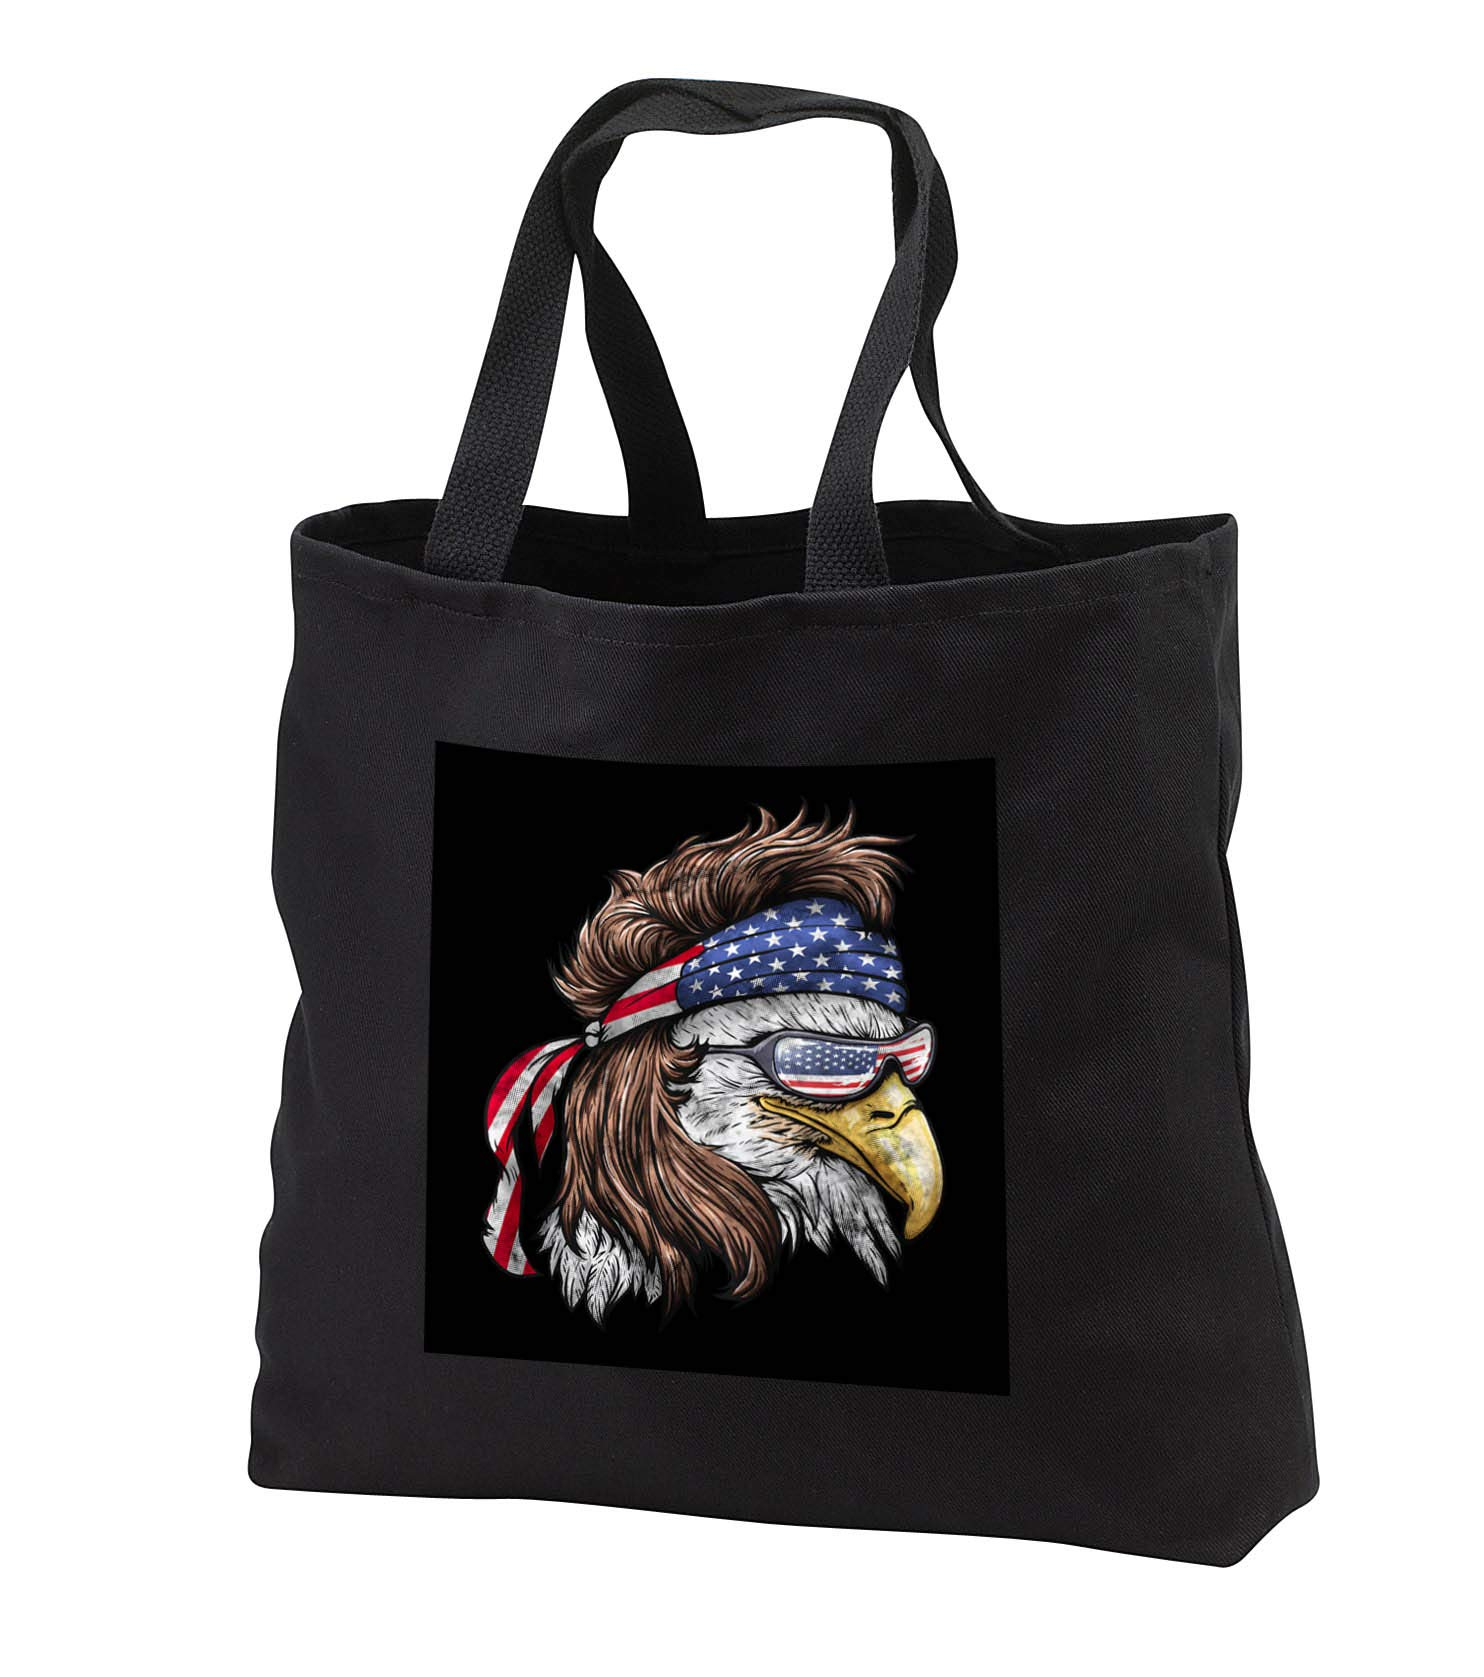 Sven Herkenrath - Animal - Cool Eagle with American Flag Bandana and Sunglasses - Tote Bags - Black Tote Bag JUMBO 20w x 15h x 5d (tb_290741_3)